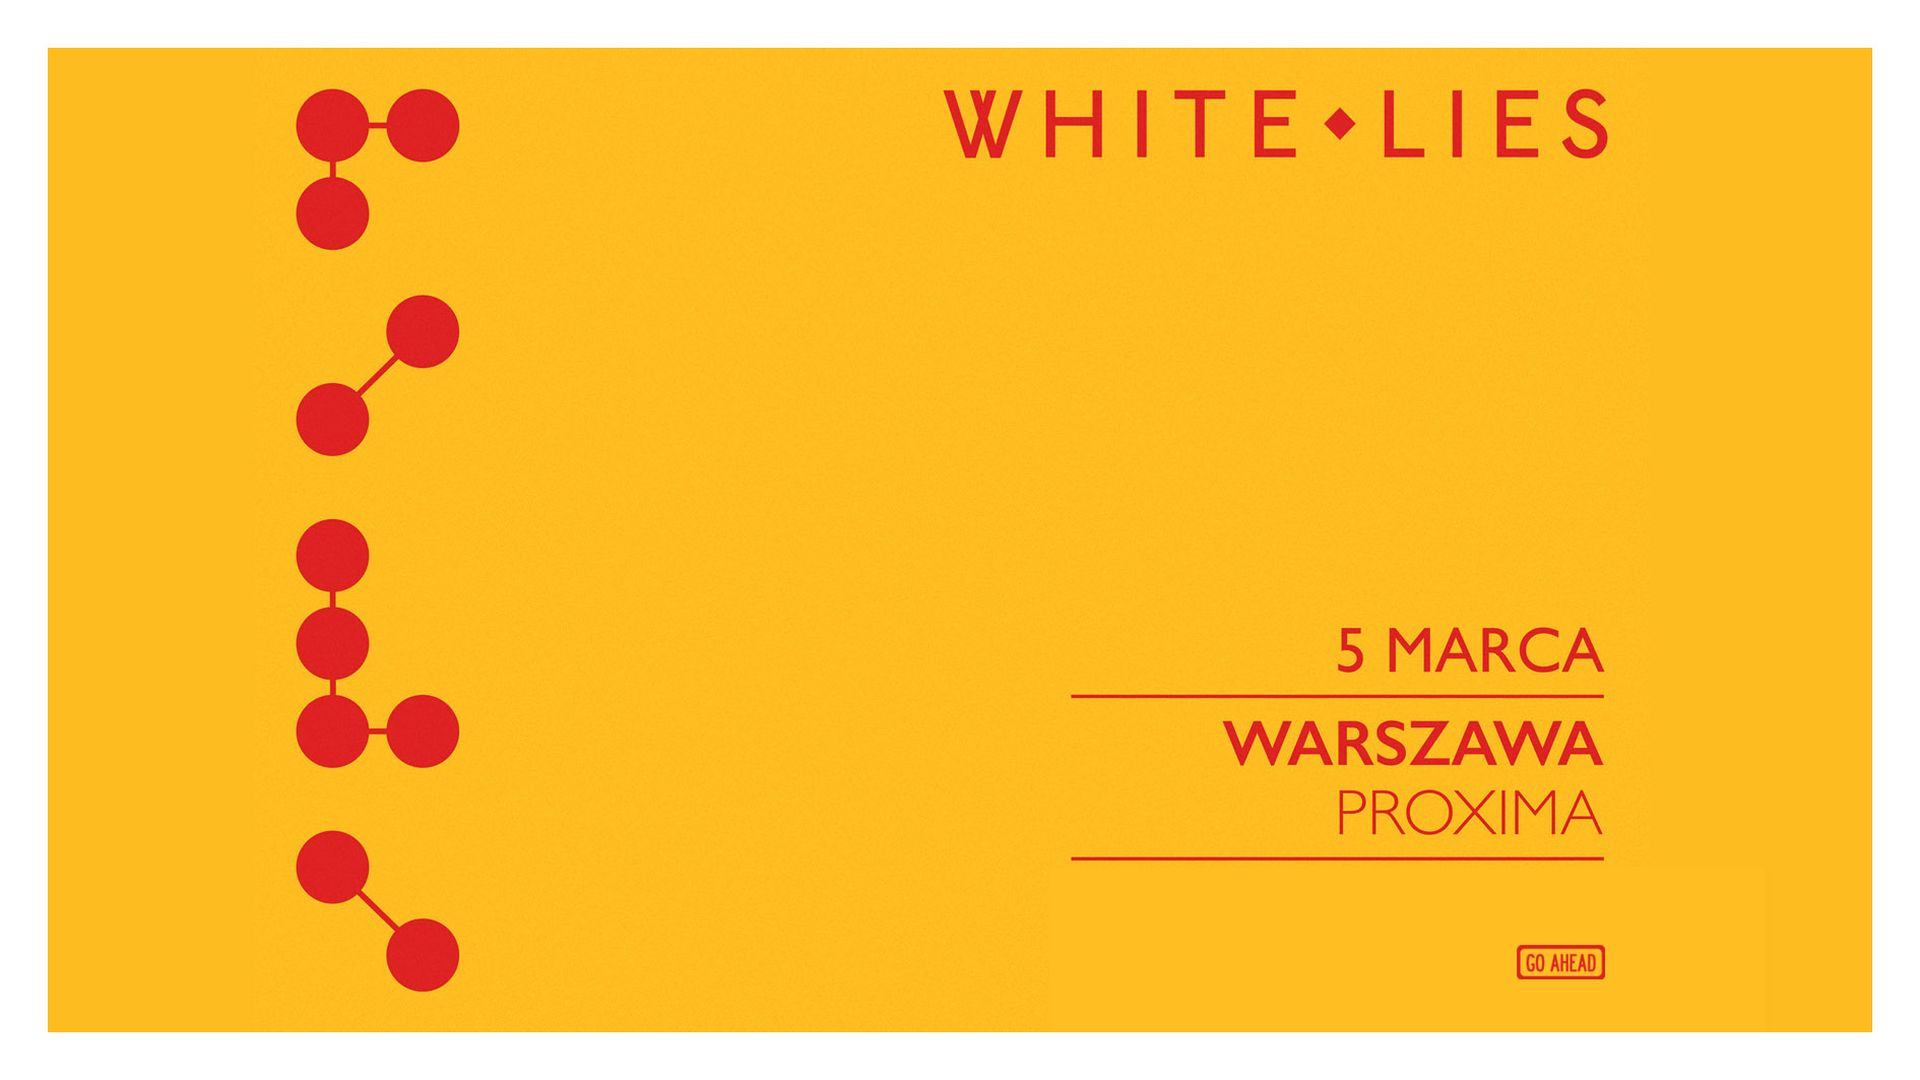 Bilety kolekcjonerskie - White Lies